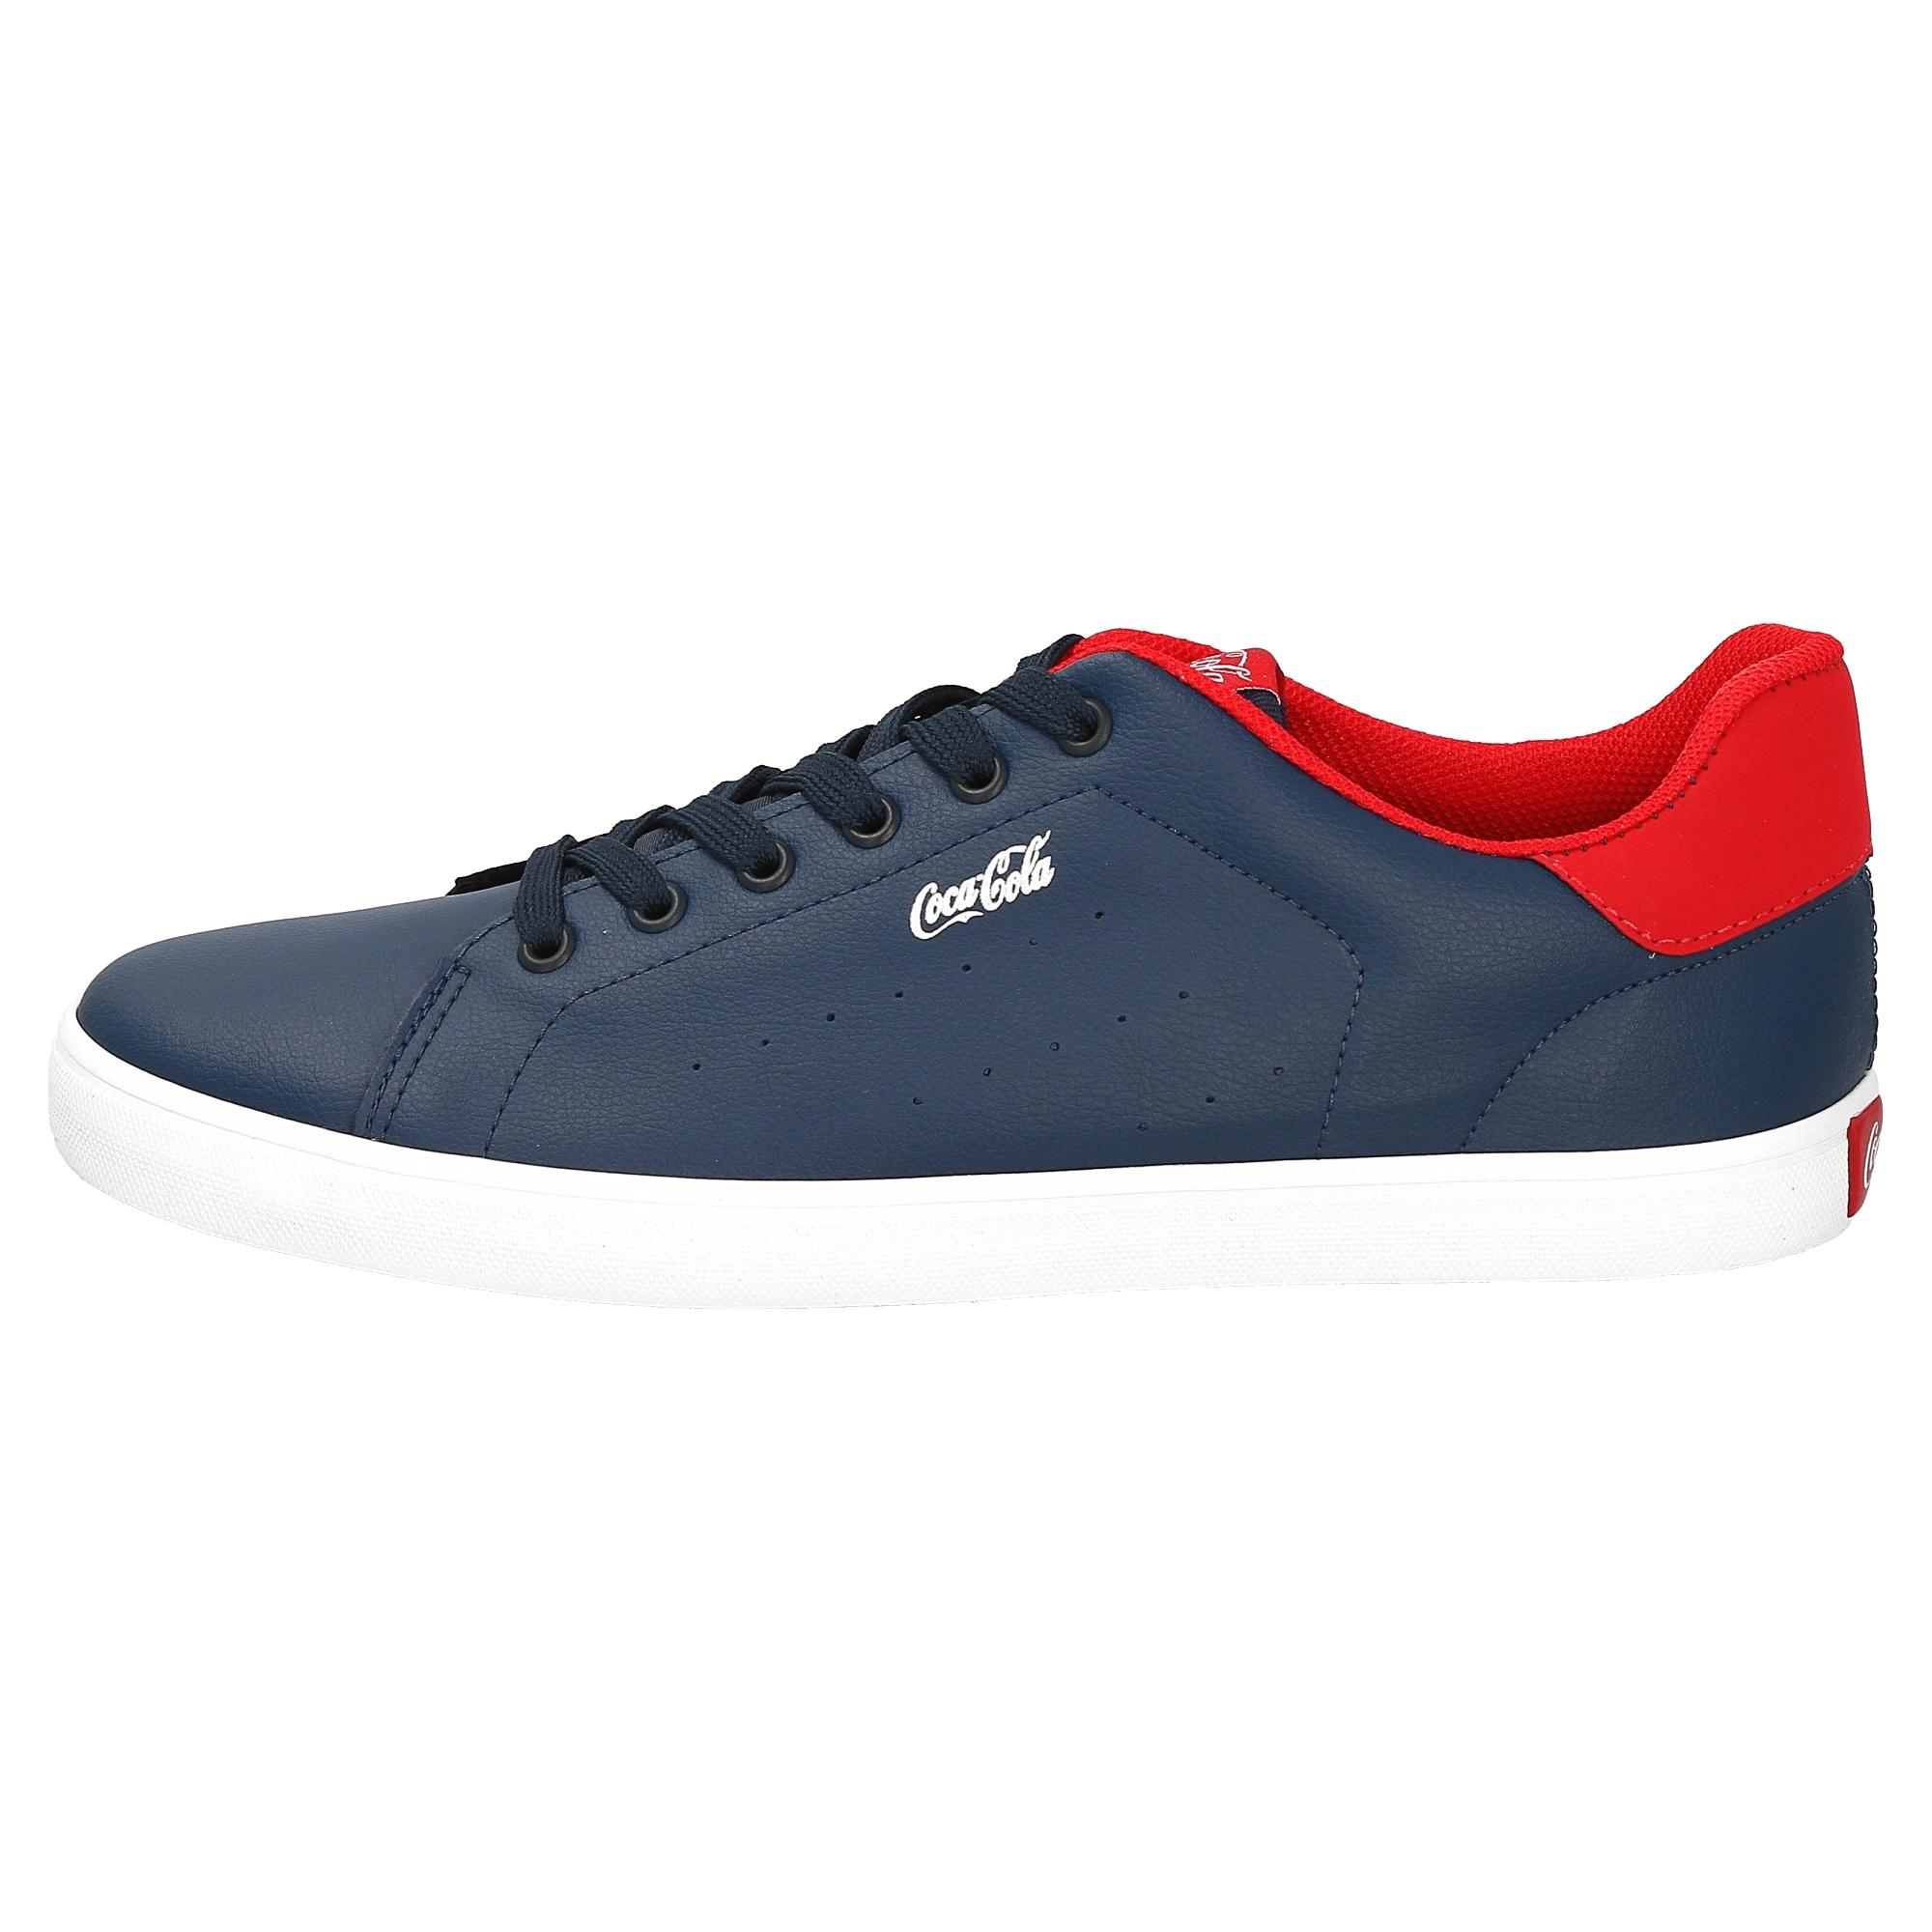 8bca6550 Trampki buty sportowe męskie Coca-Cola LAKED r 45 - 7572358756 ...